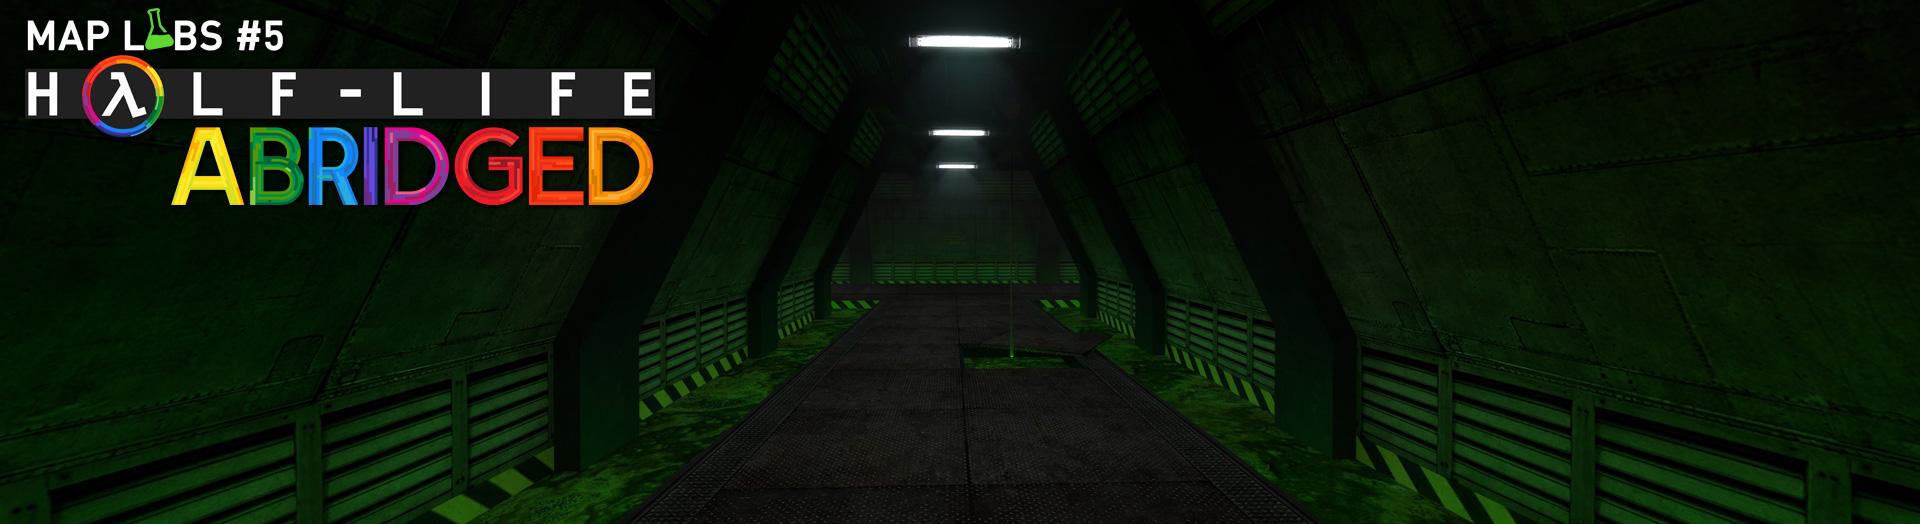 Half-Life: Abridged